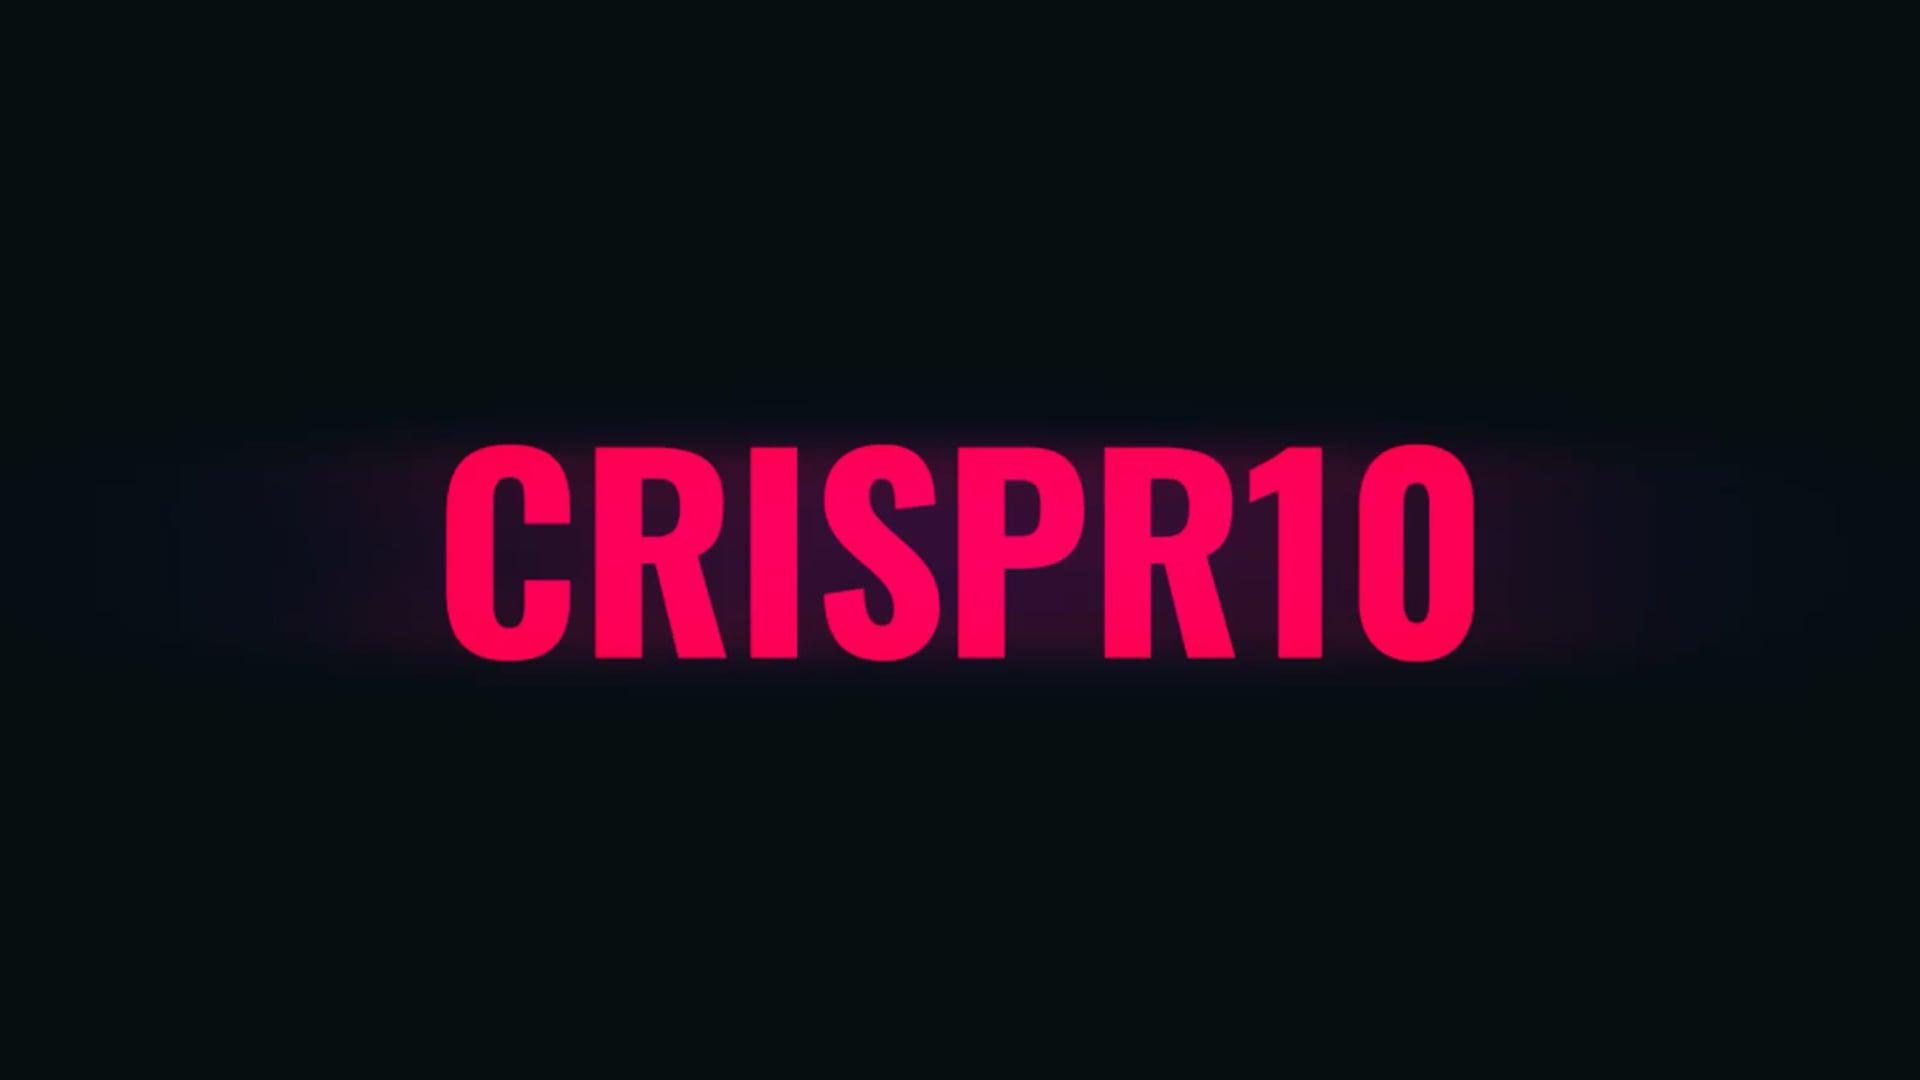 CRISPR10